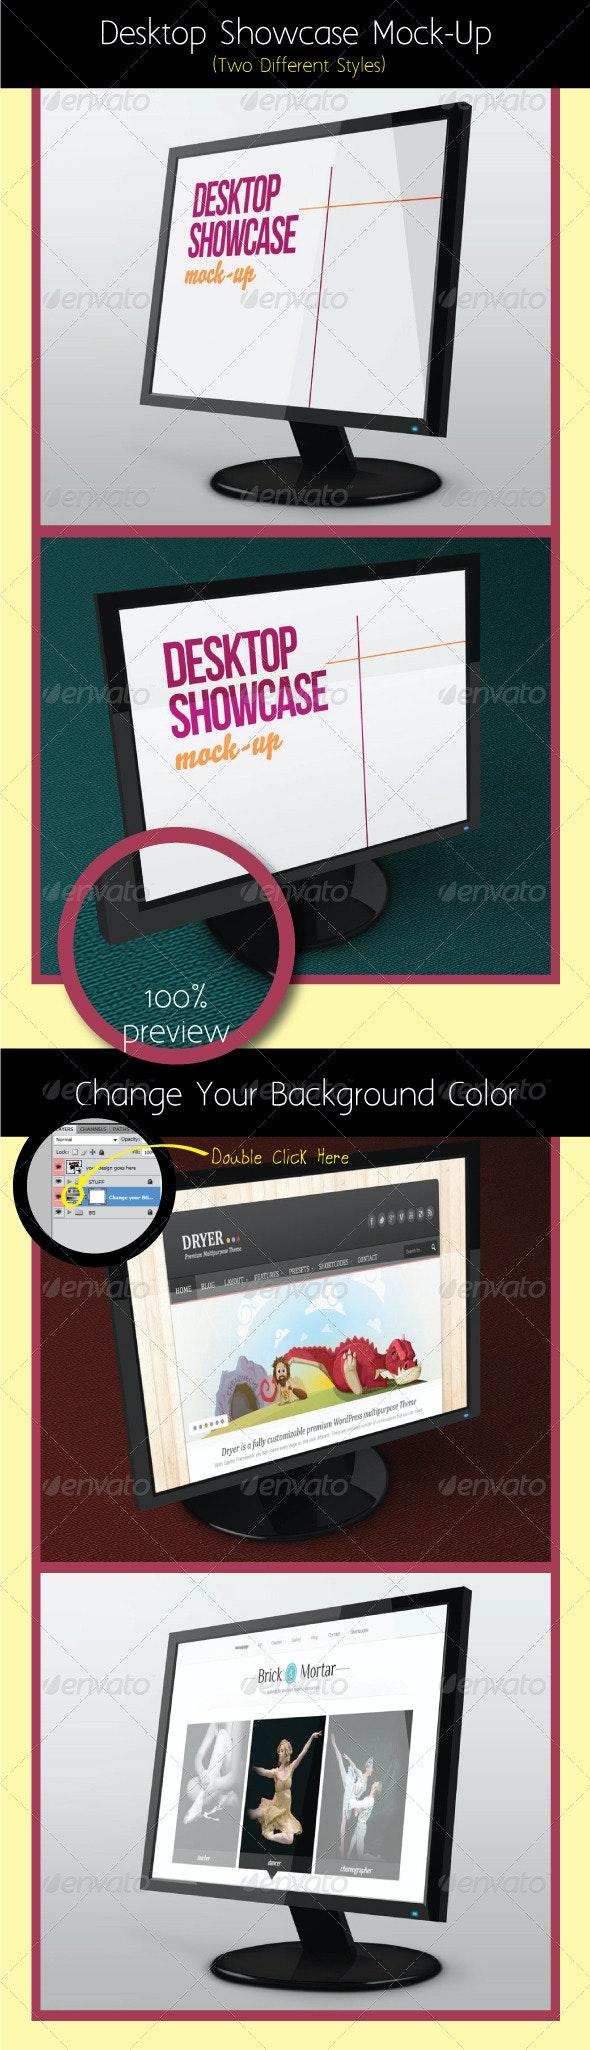 Desktop Showcase Mock-Up - Monitors Displays